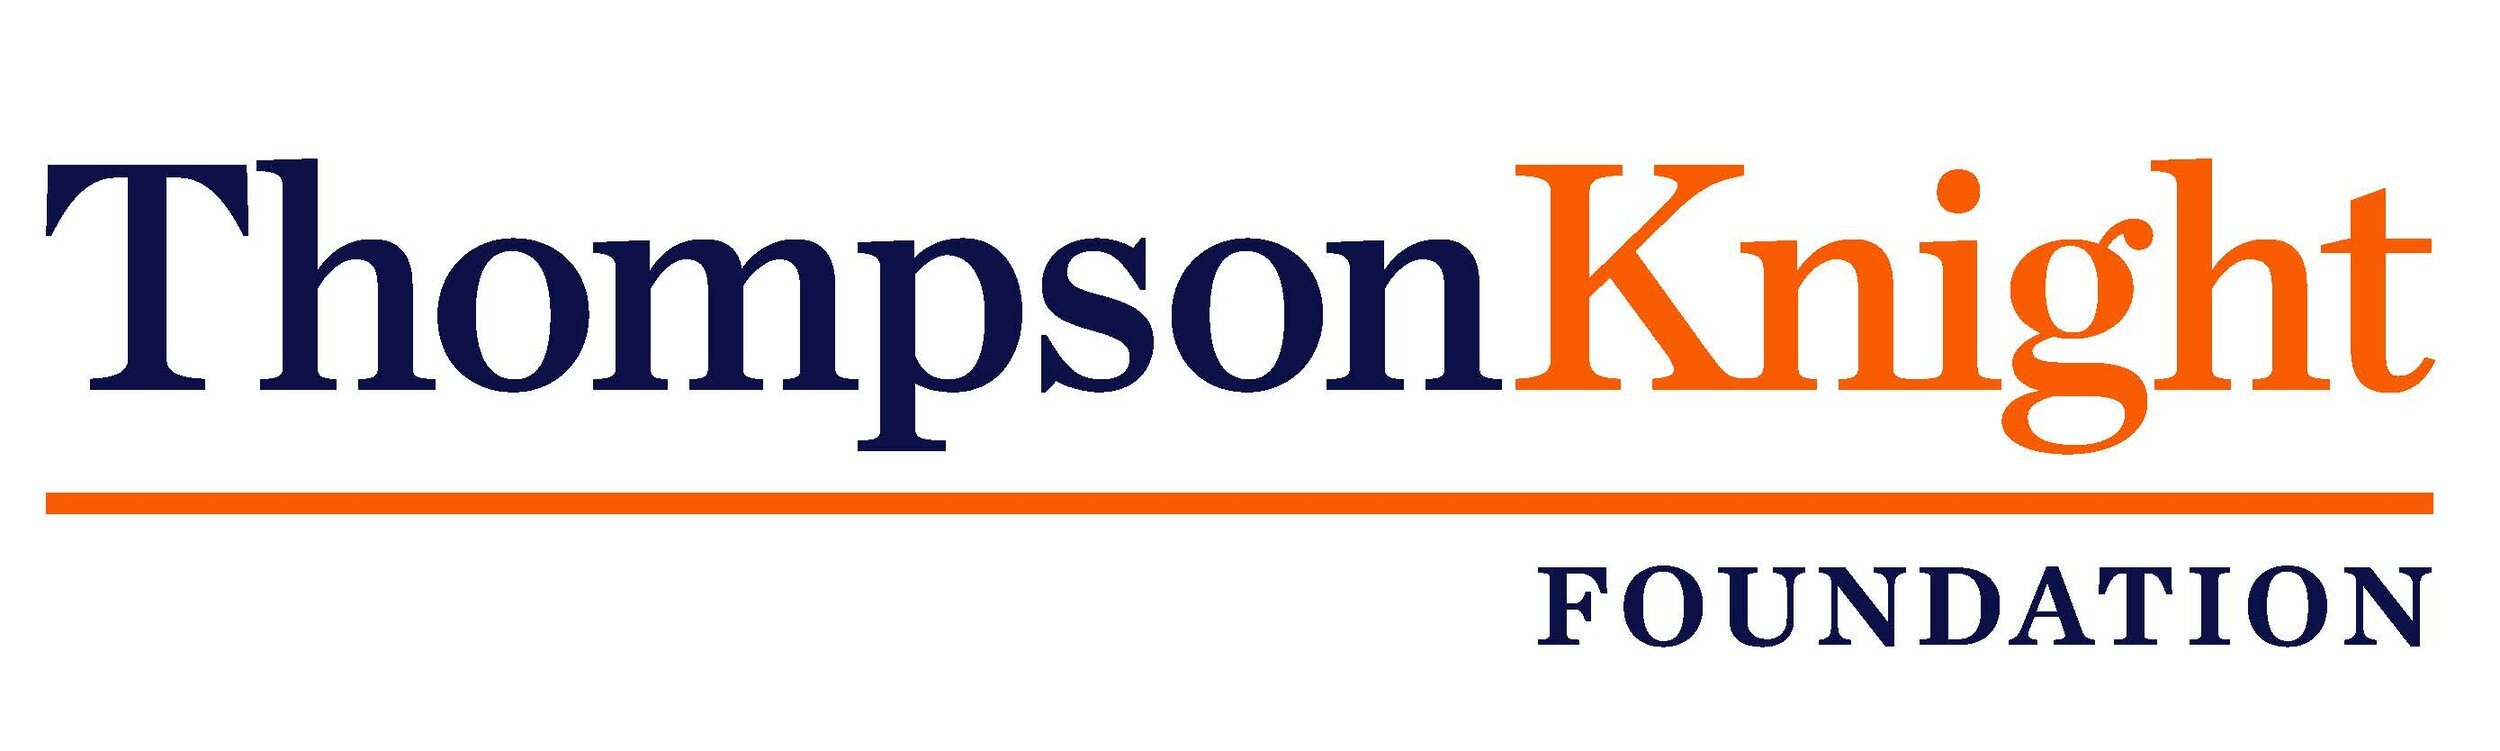 TK Foundation Logo PMS 2756C 1655C.jpg